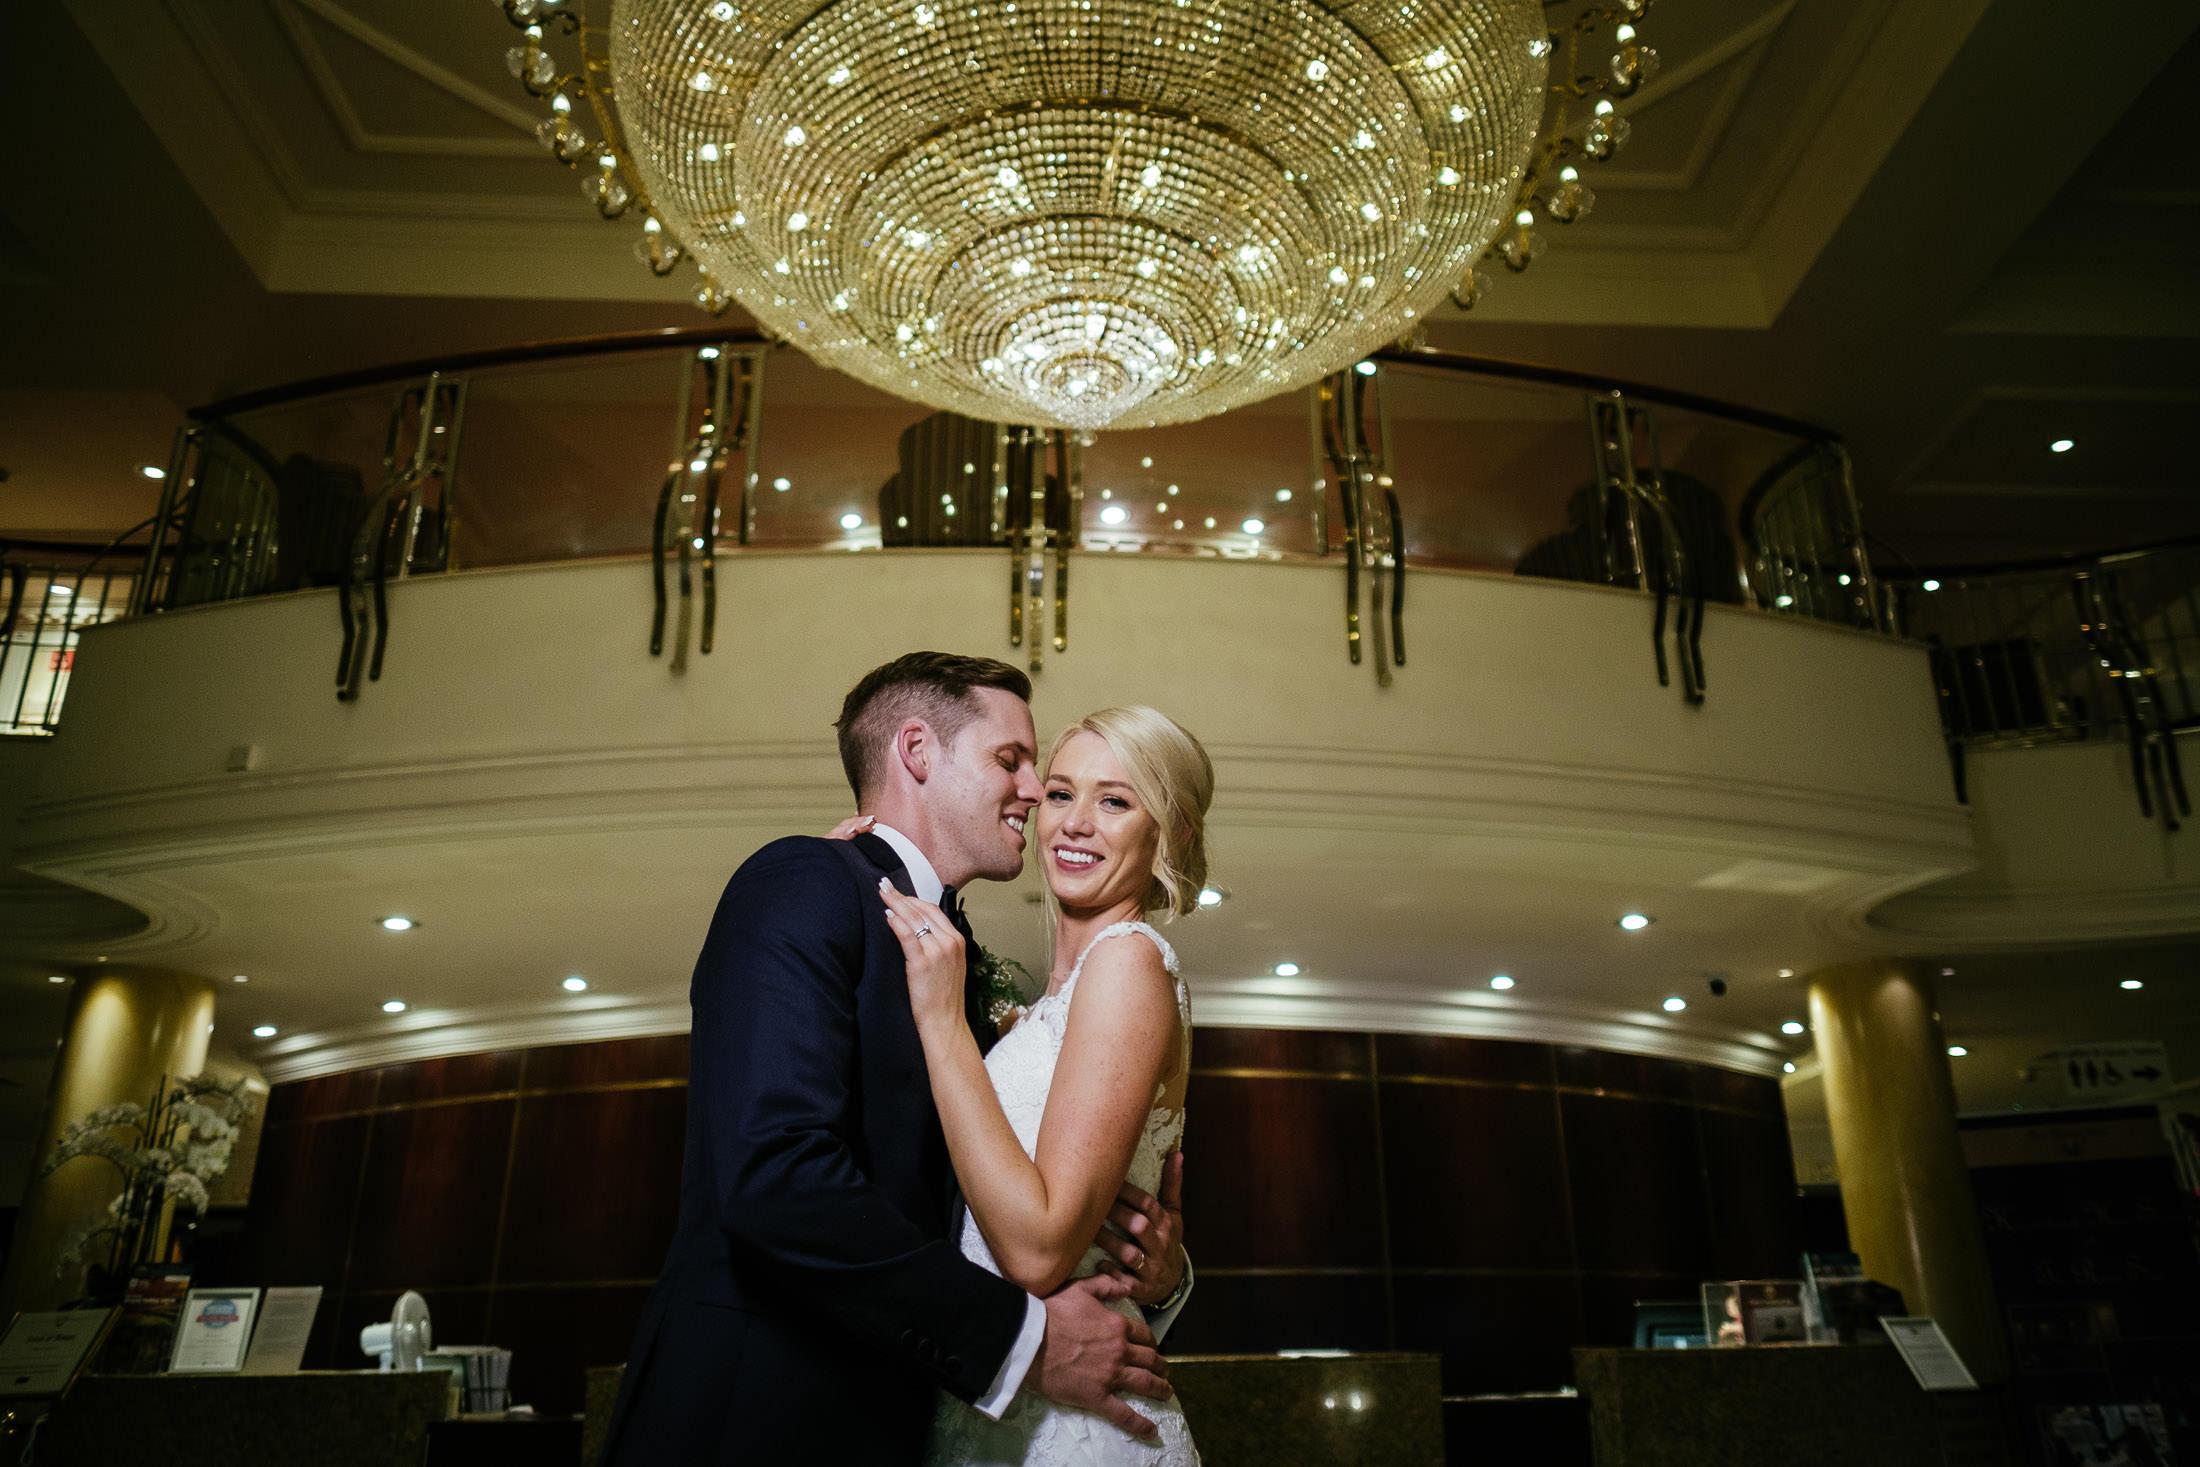 Knightsbrook Hotel Trim Castle Wedding Photographer 115